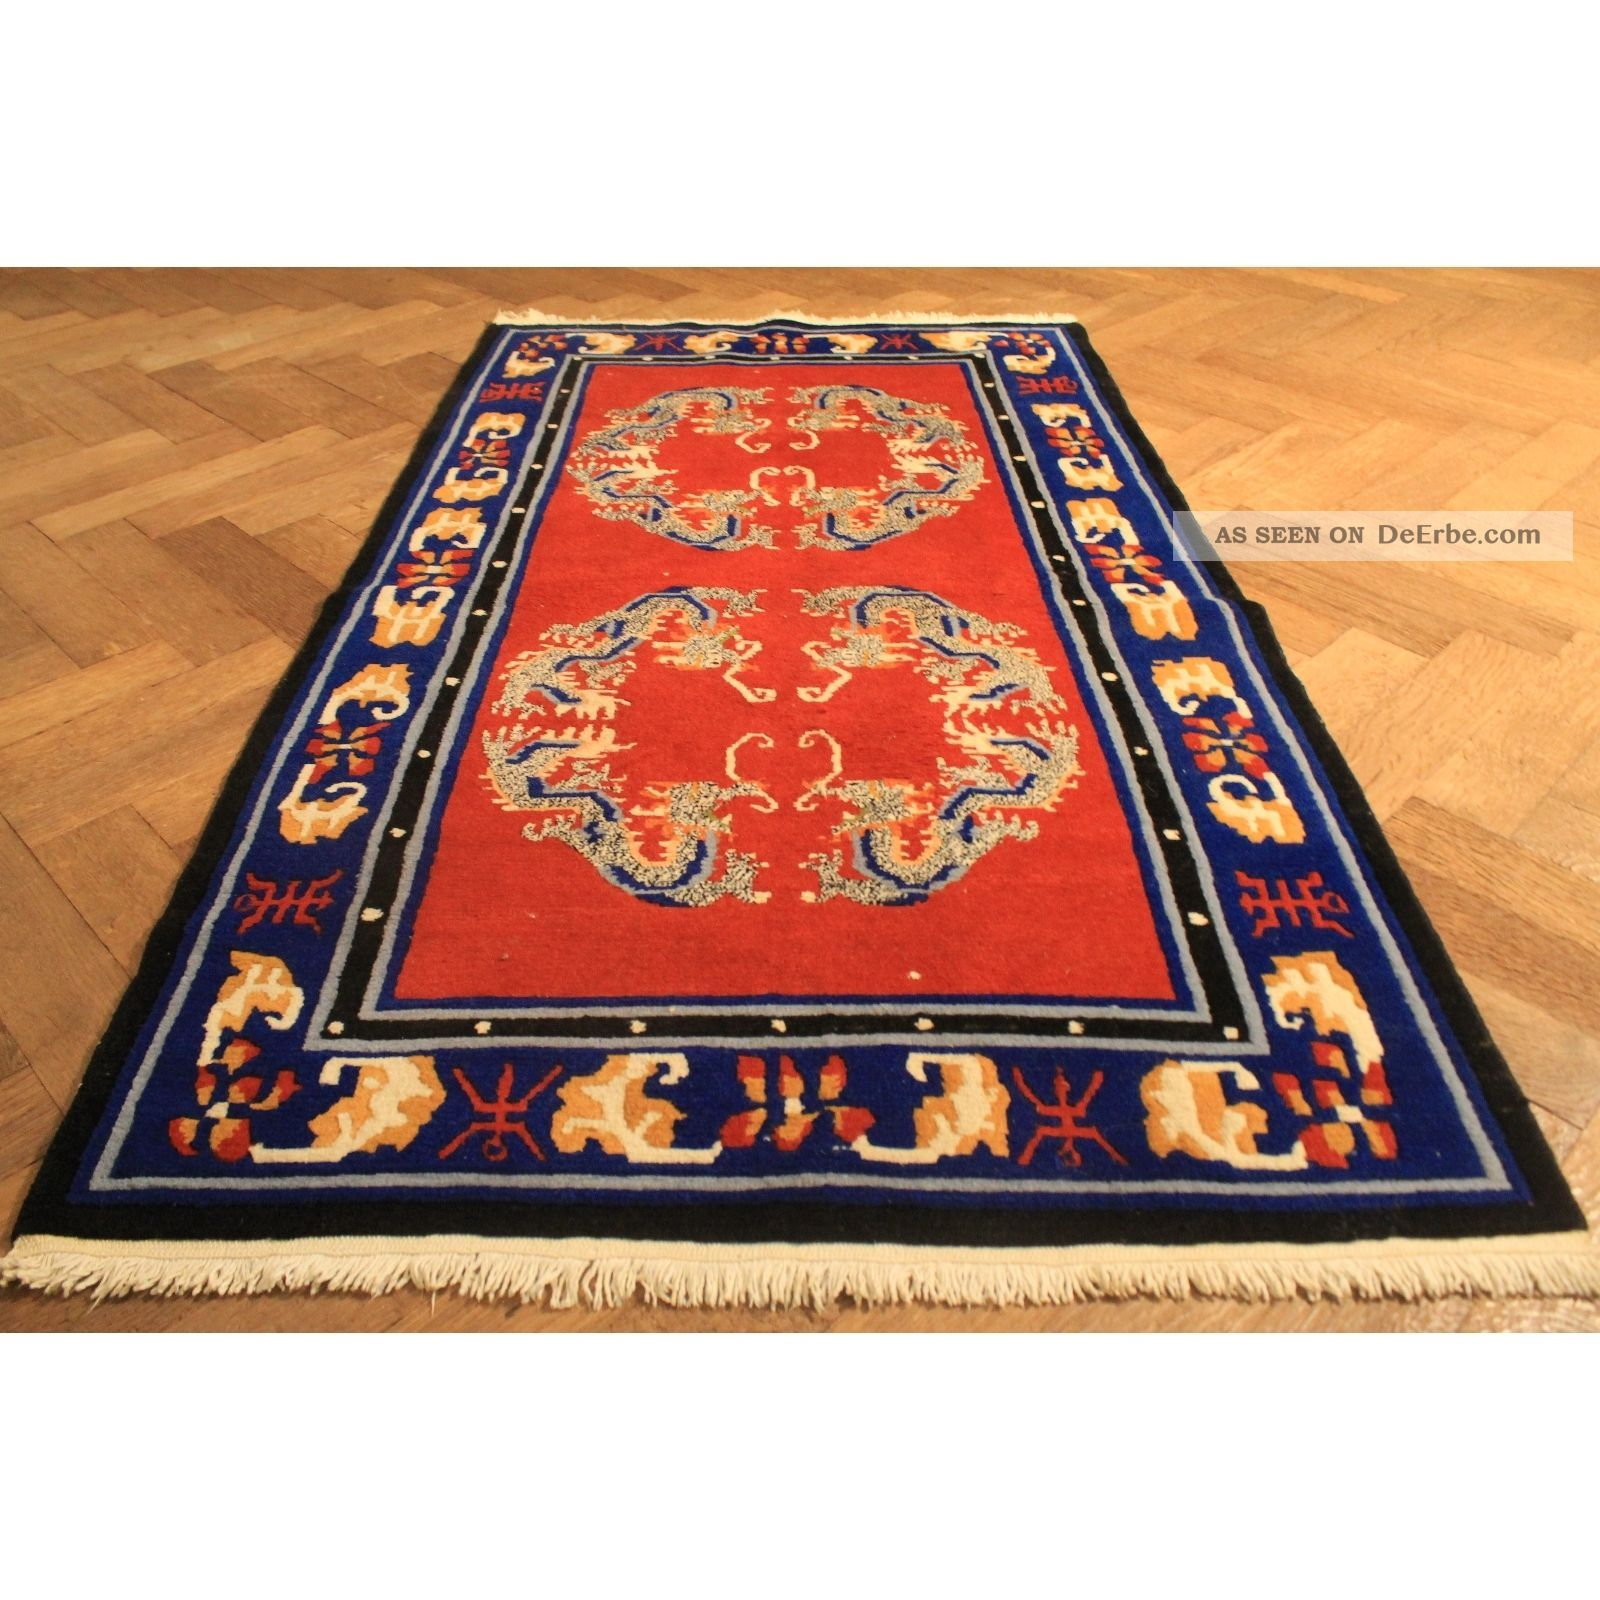 sch ner handgekn pfter orient teppich drachen china art deco old carpet tappeto. Black Bedroom Furniture Sets. Home Design Ideas